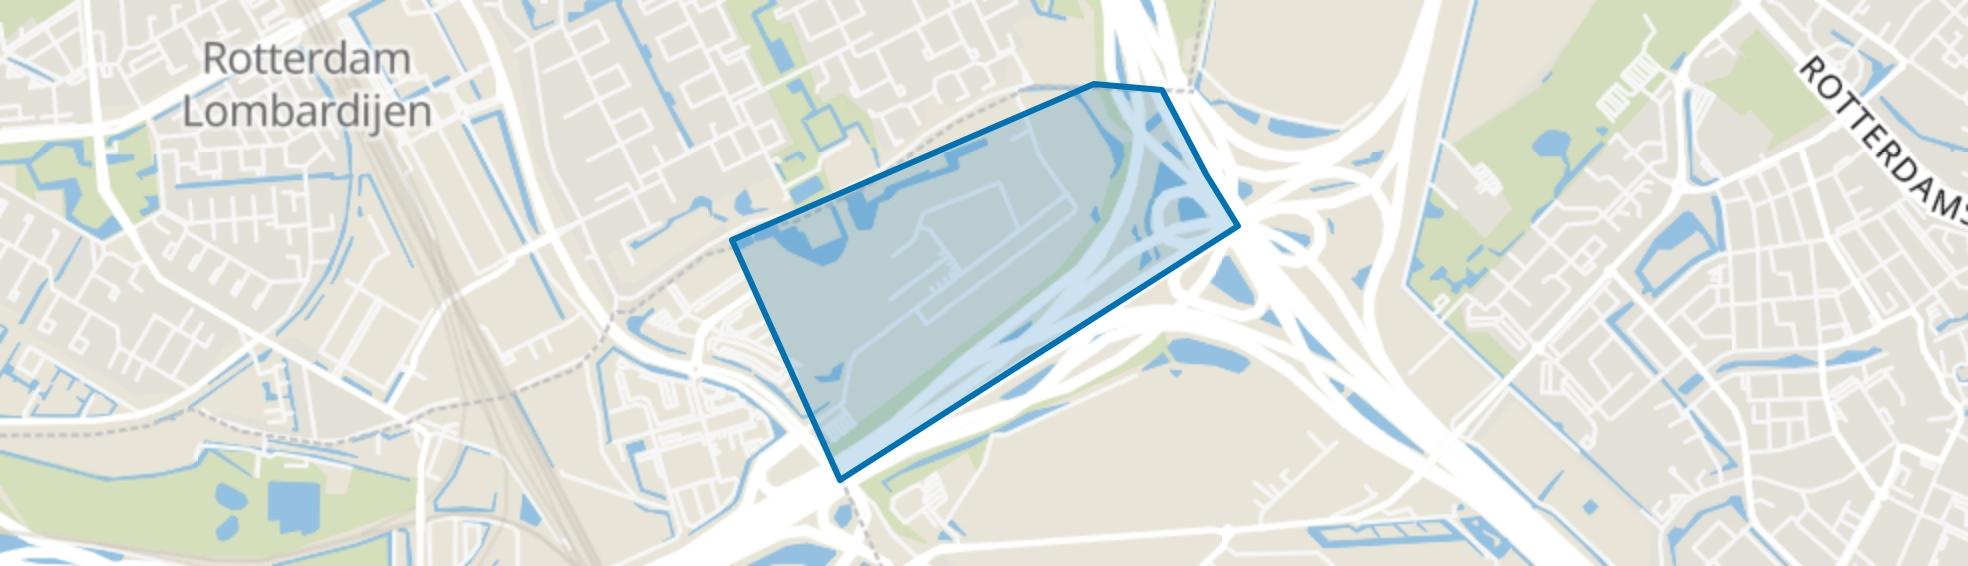 Cornelisland, Ridderkerk map